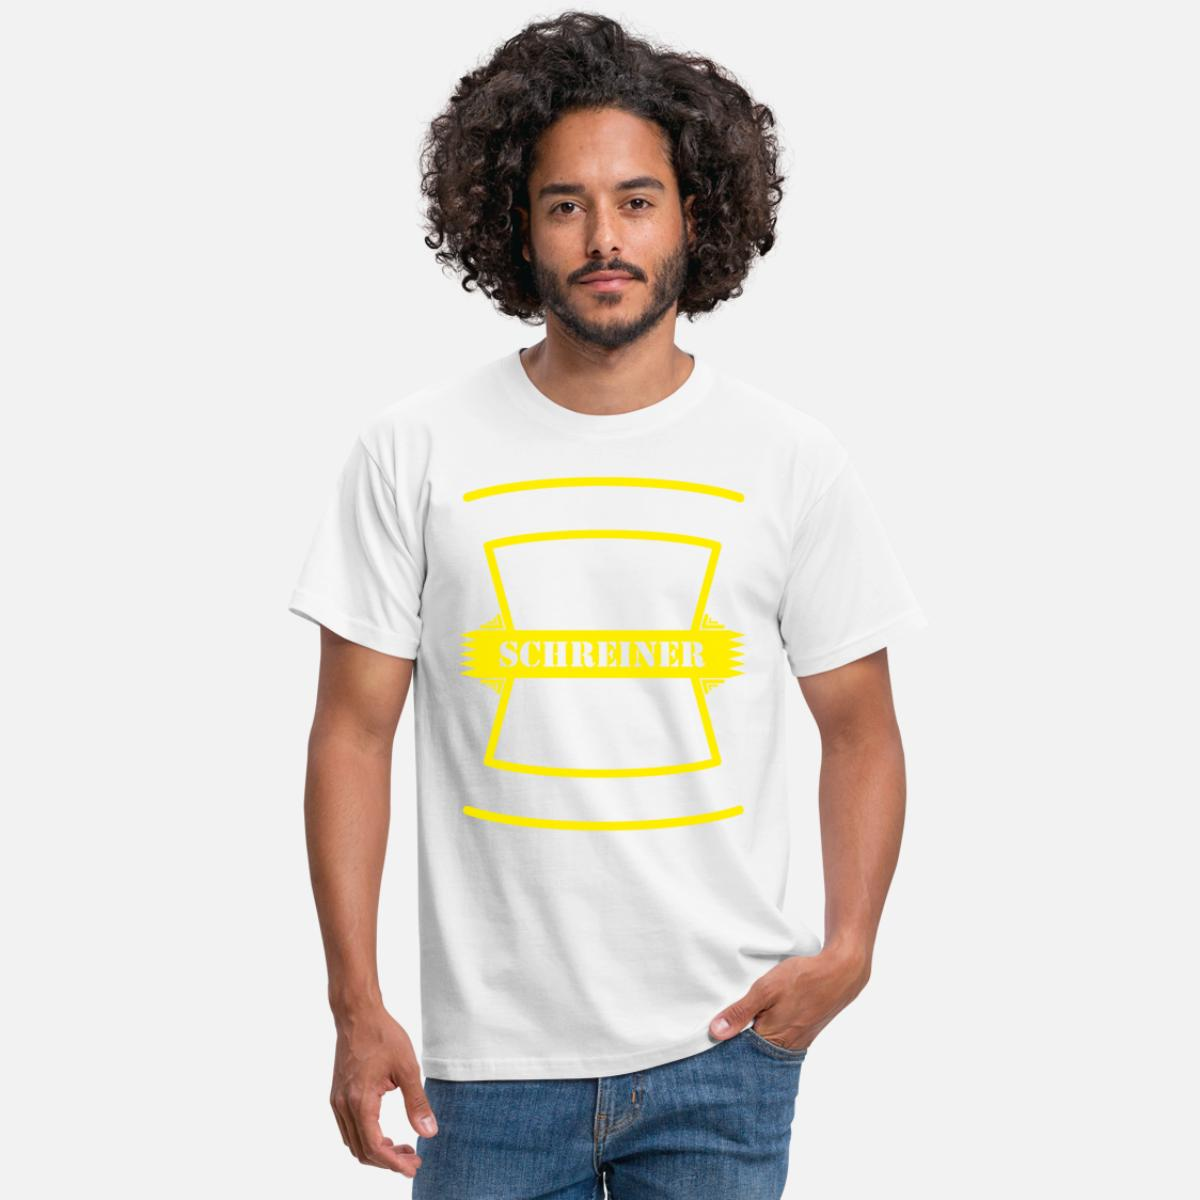 Schreiner T Shirts' Männer T Shirt   Spreadshirt